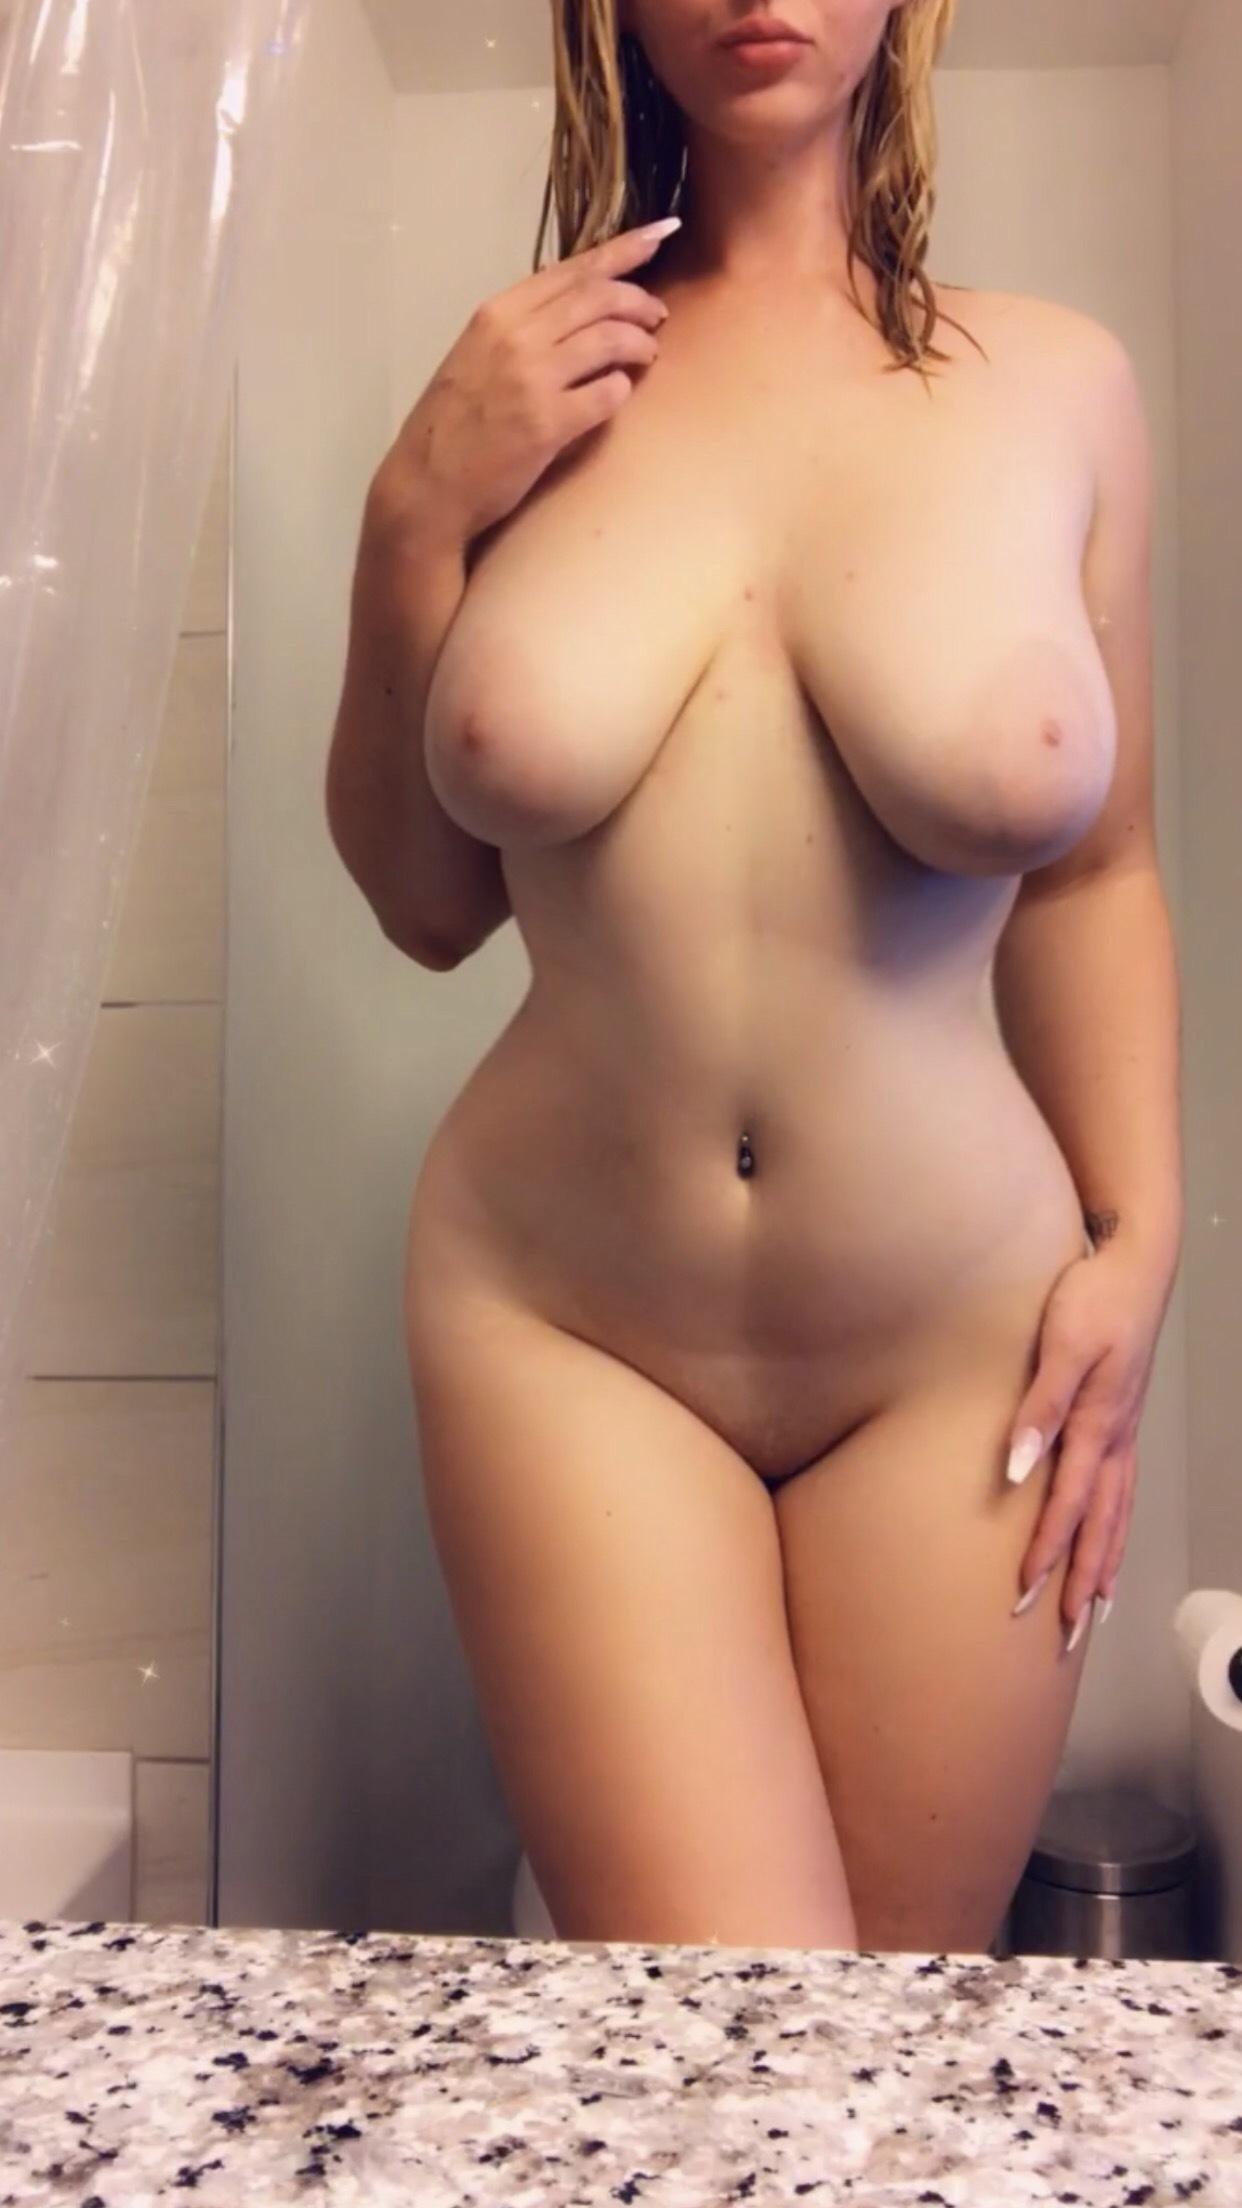 Blonde nude Porn Star